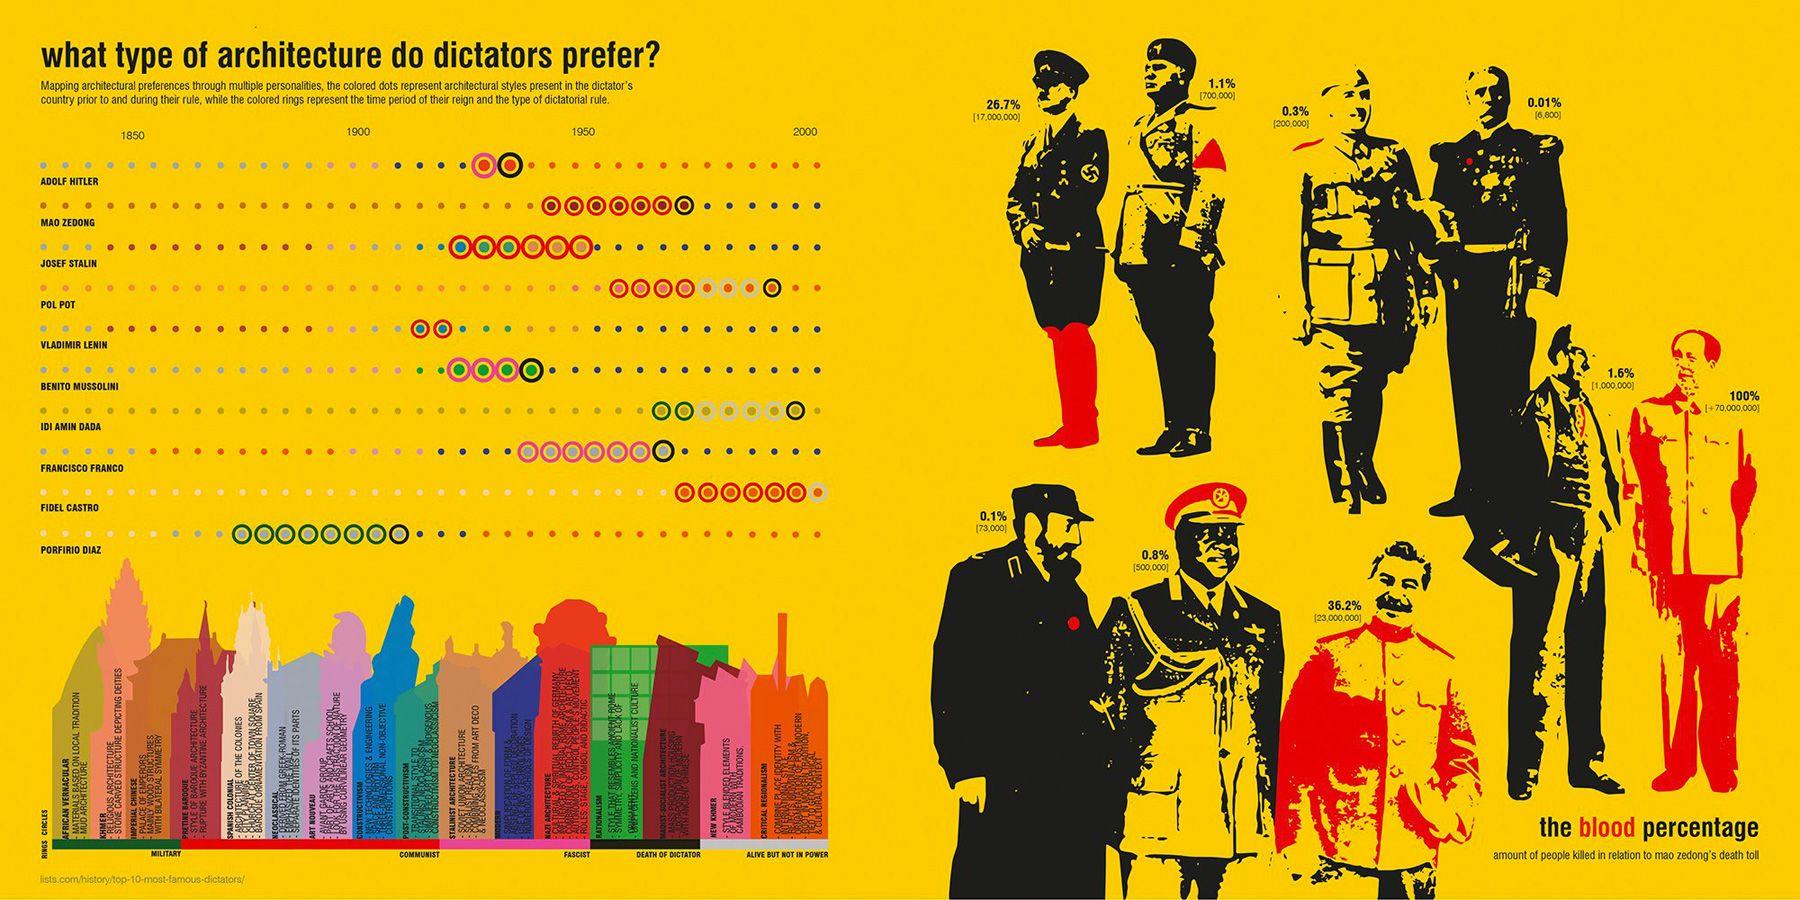 archi-graphic-infographic-look-at-architecture-frank-jacobus-designboom-03